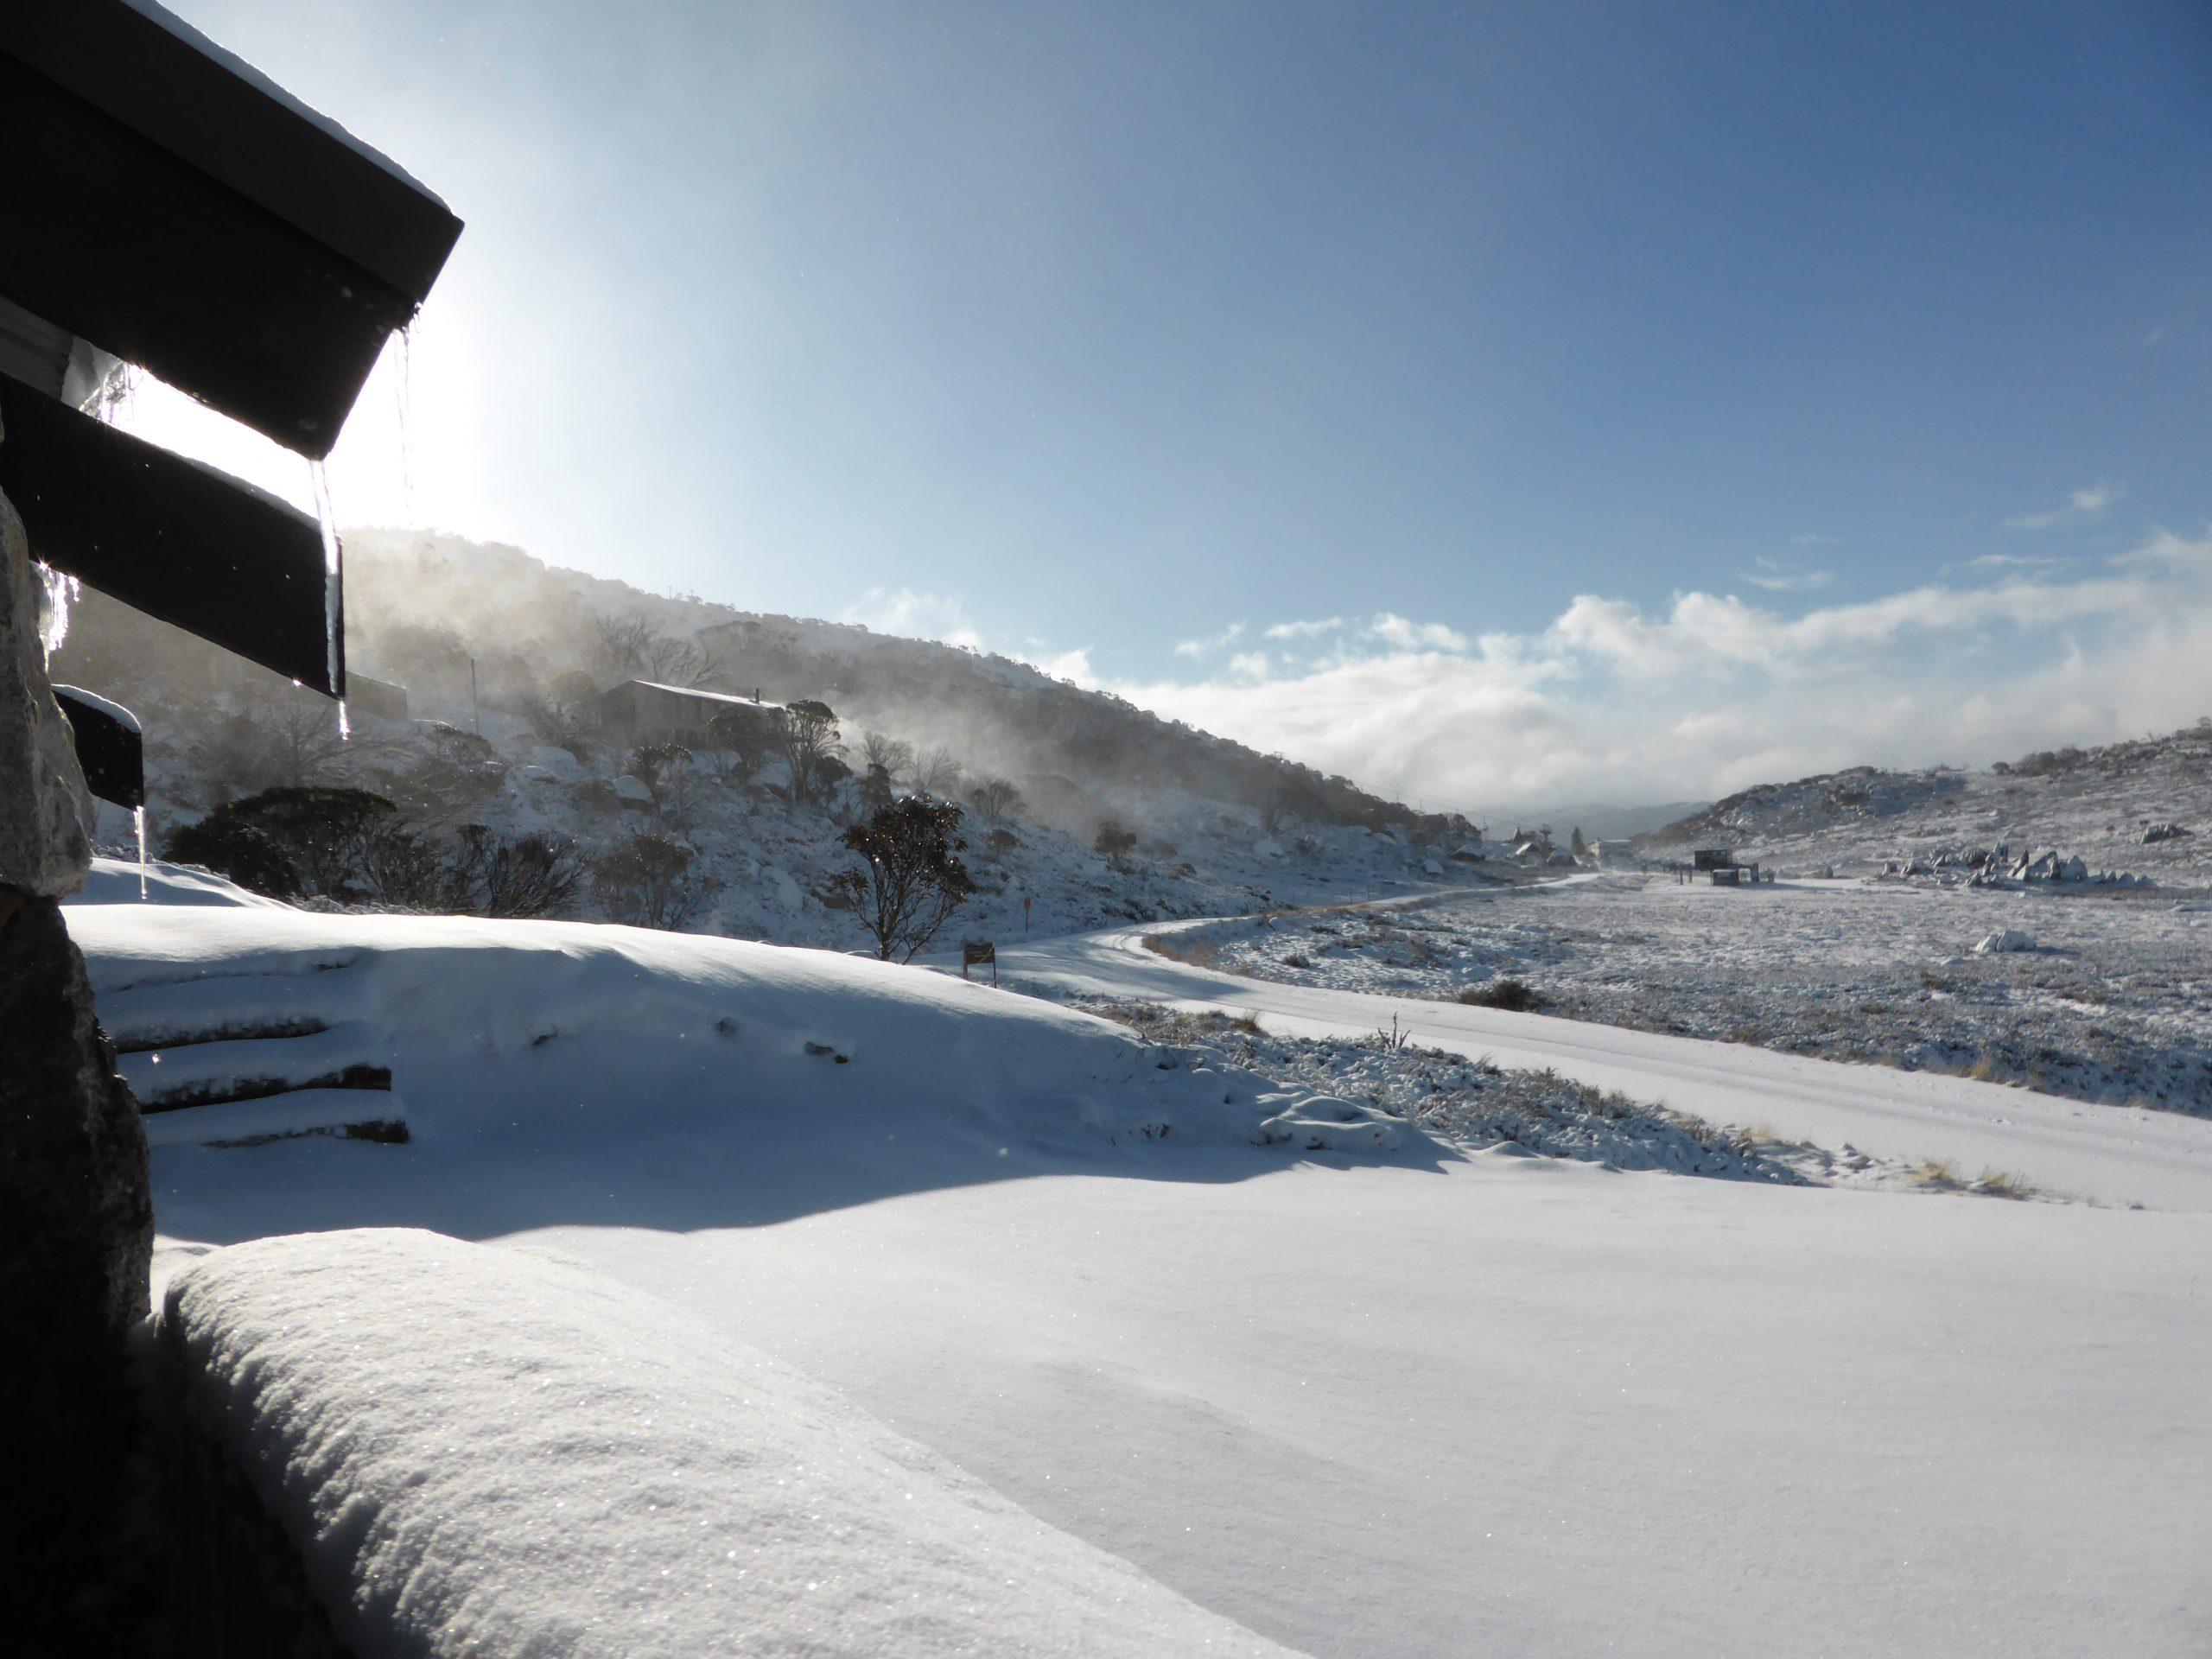 Snowy vista